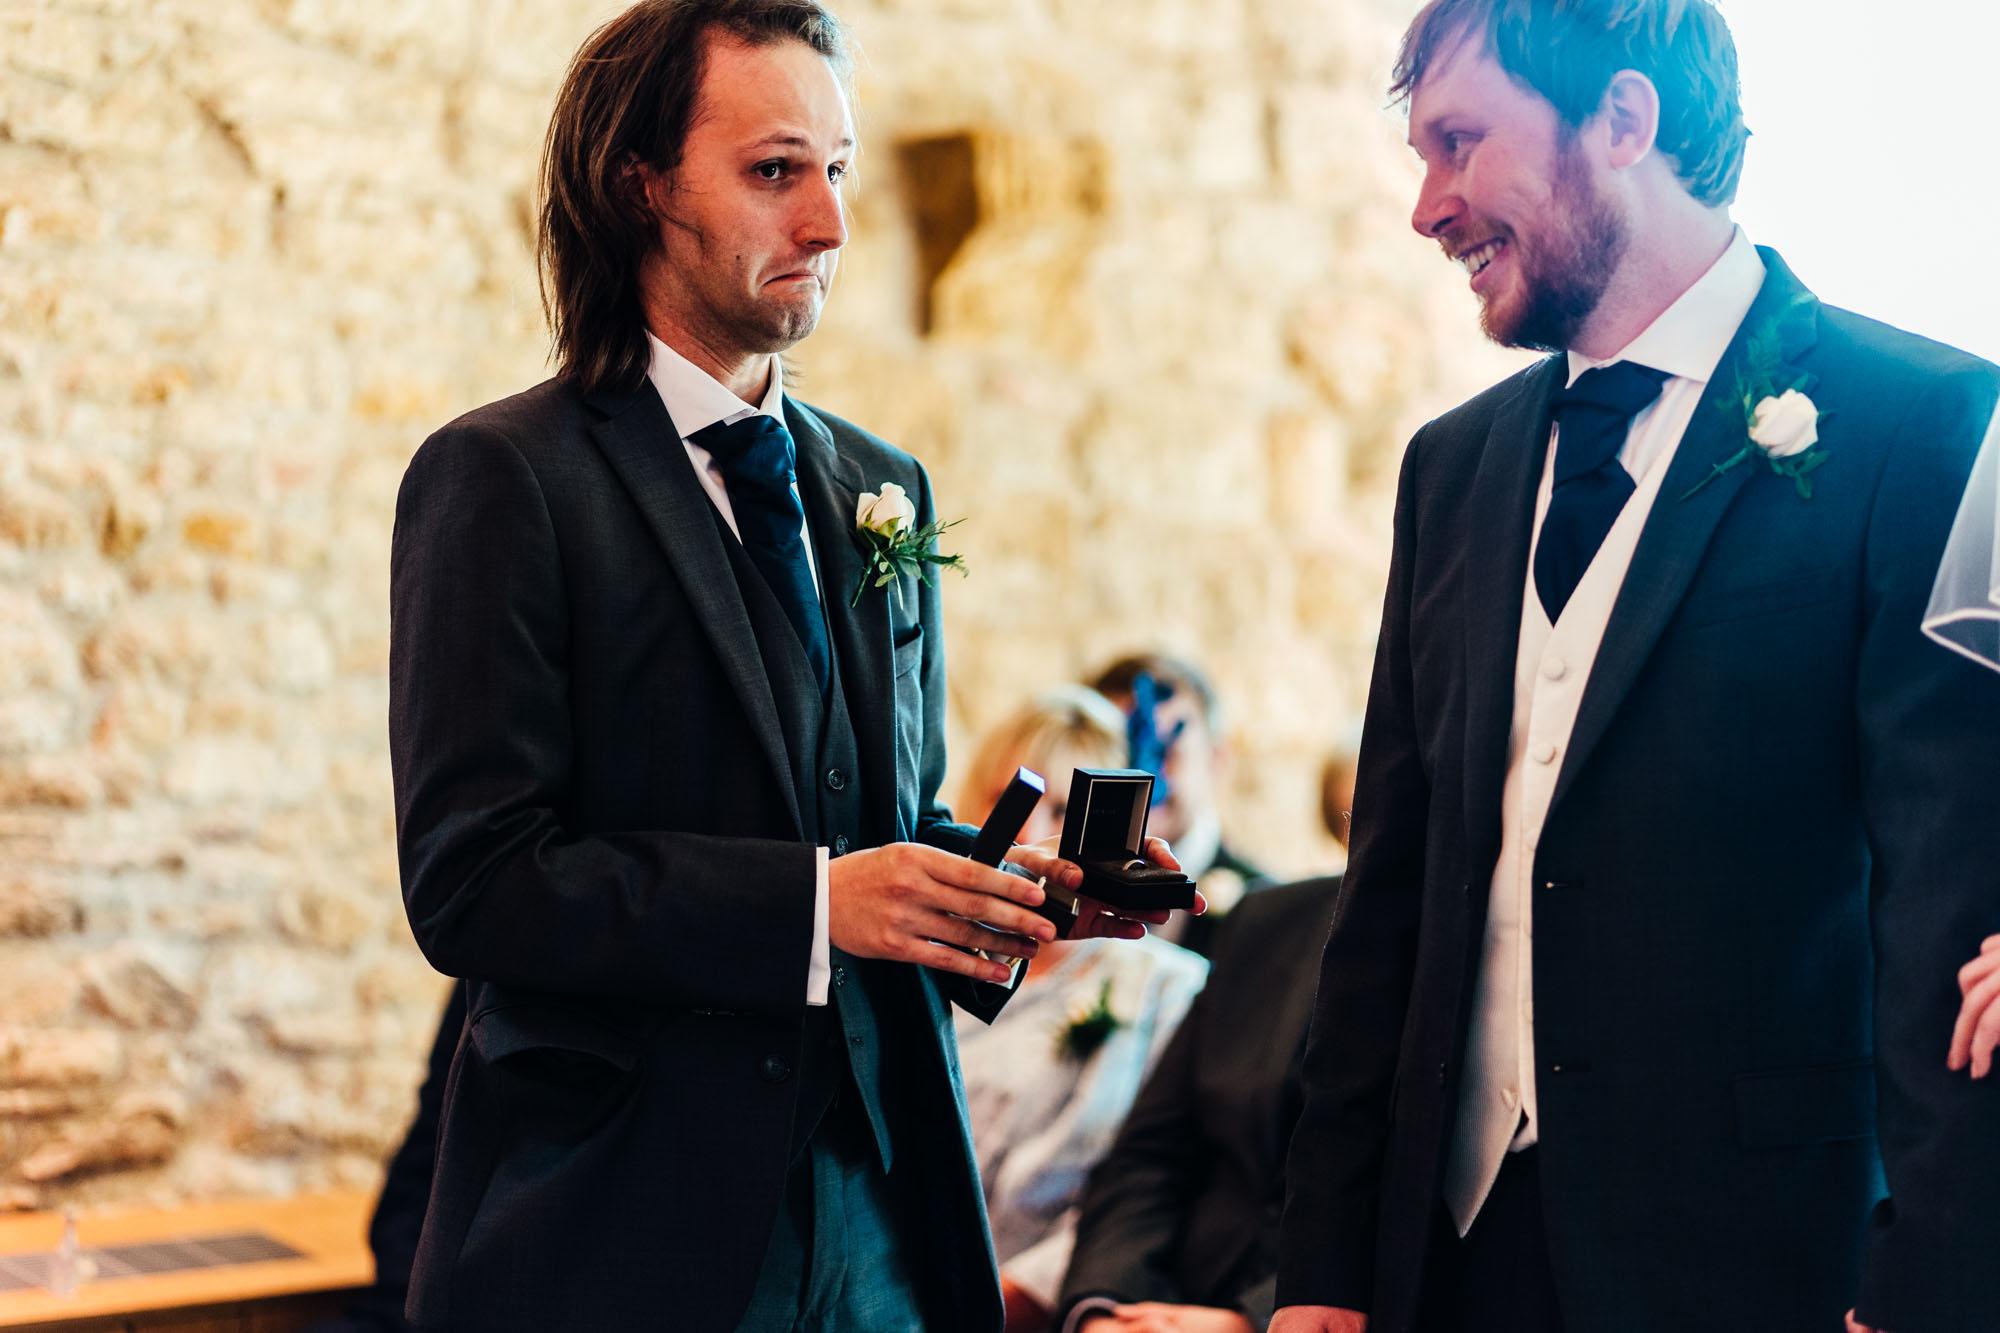 wedding-at-dodford-manor-38